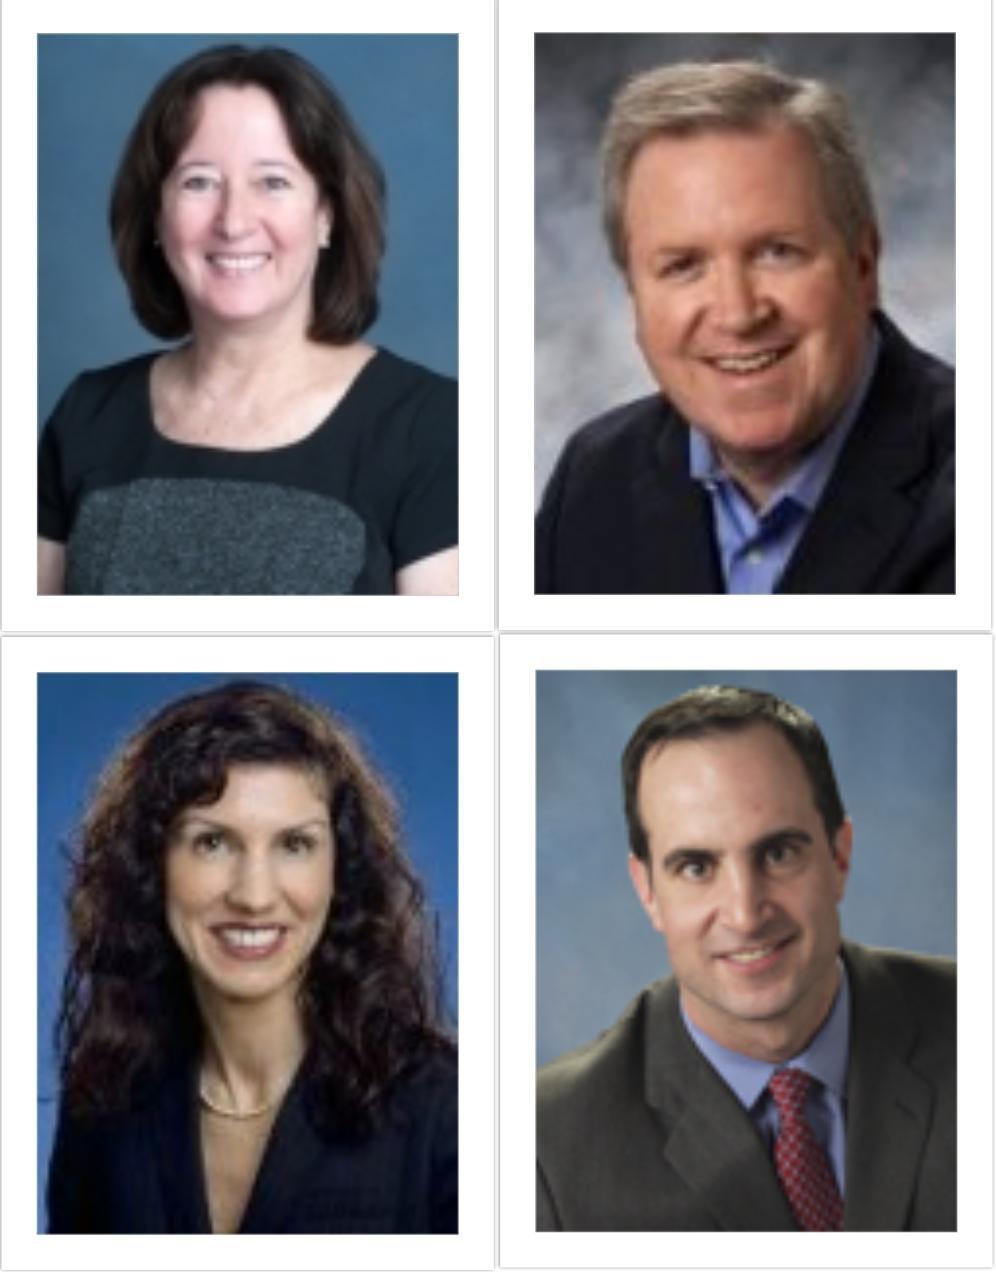 Top Left: Patricia Costello; Top Right: William Krovatin; Bottom Left: Mary Frances Palisano; Bottom Right: Geoffrey Rosamond